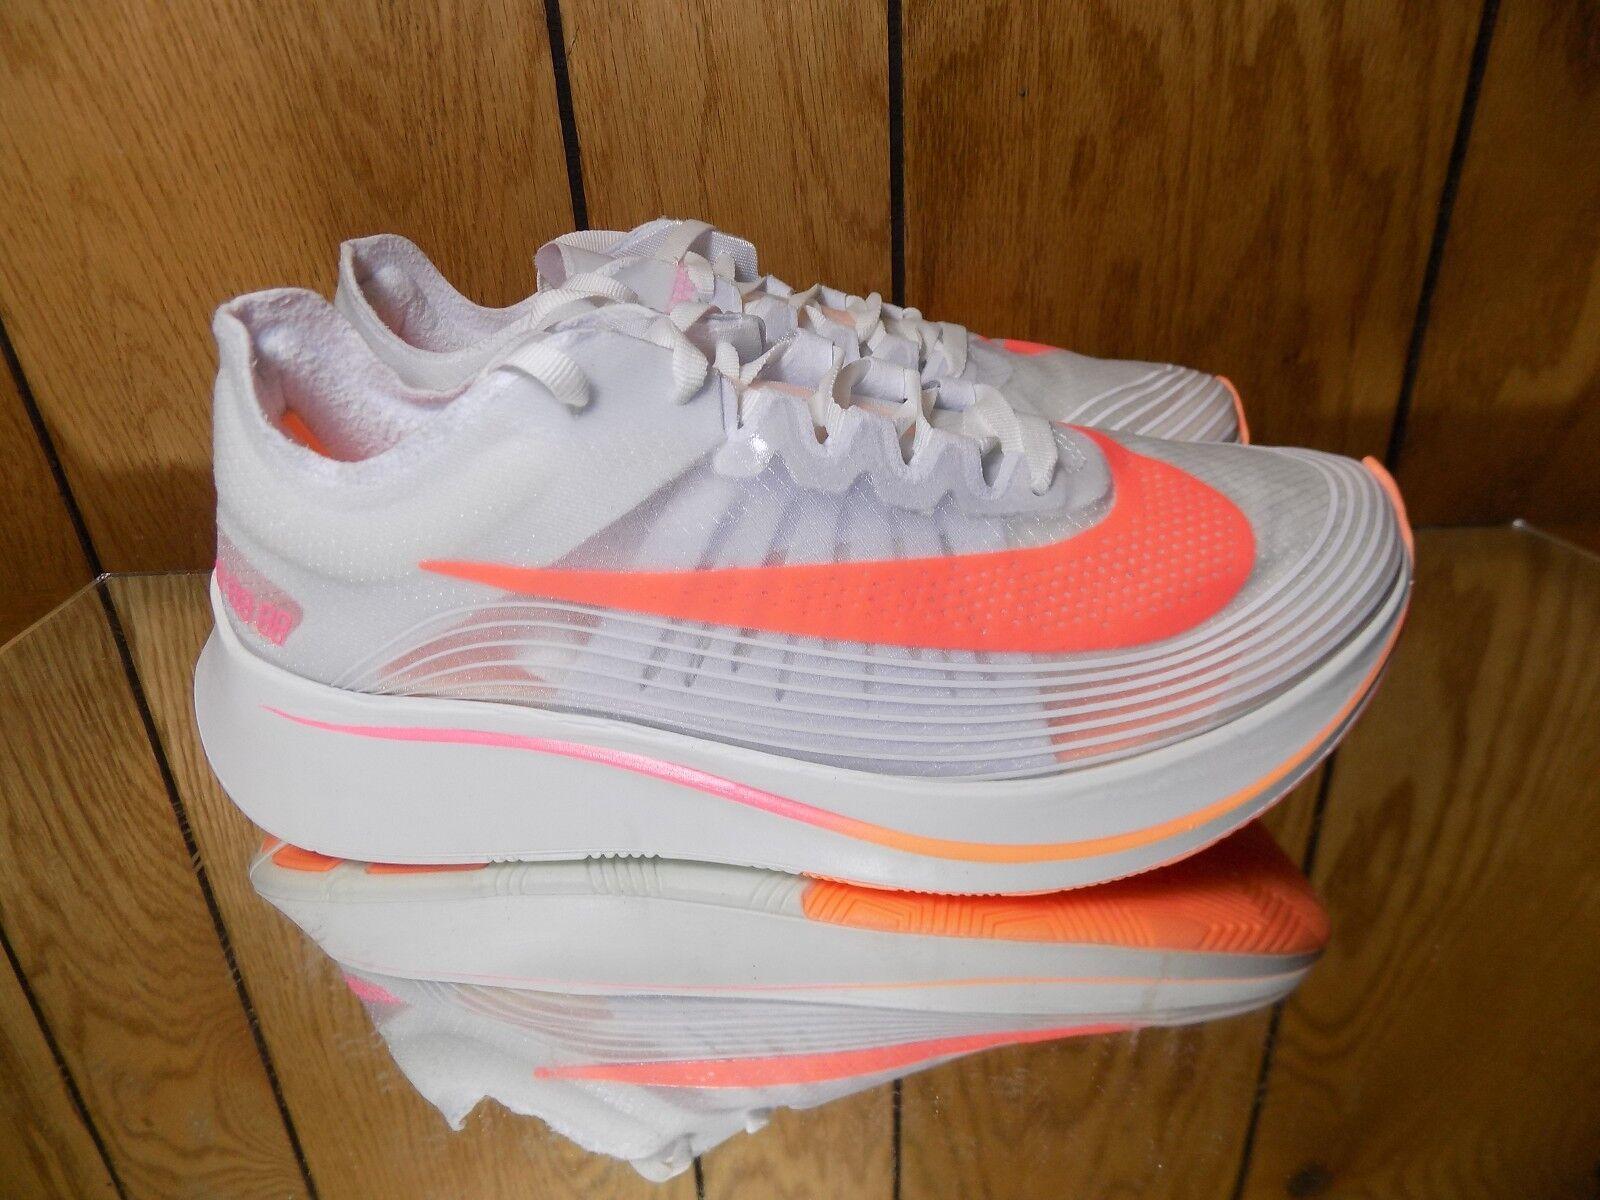 Women's Nike Zoom Fly SP Sz 8 White/Sunset Pulse AJ8229-108 s 8.5